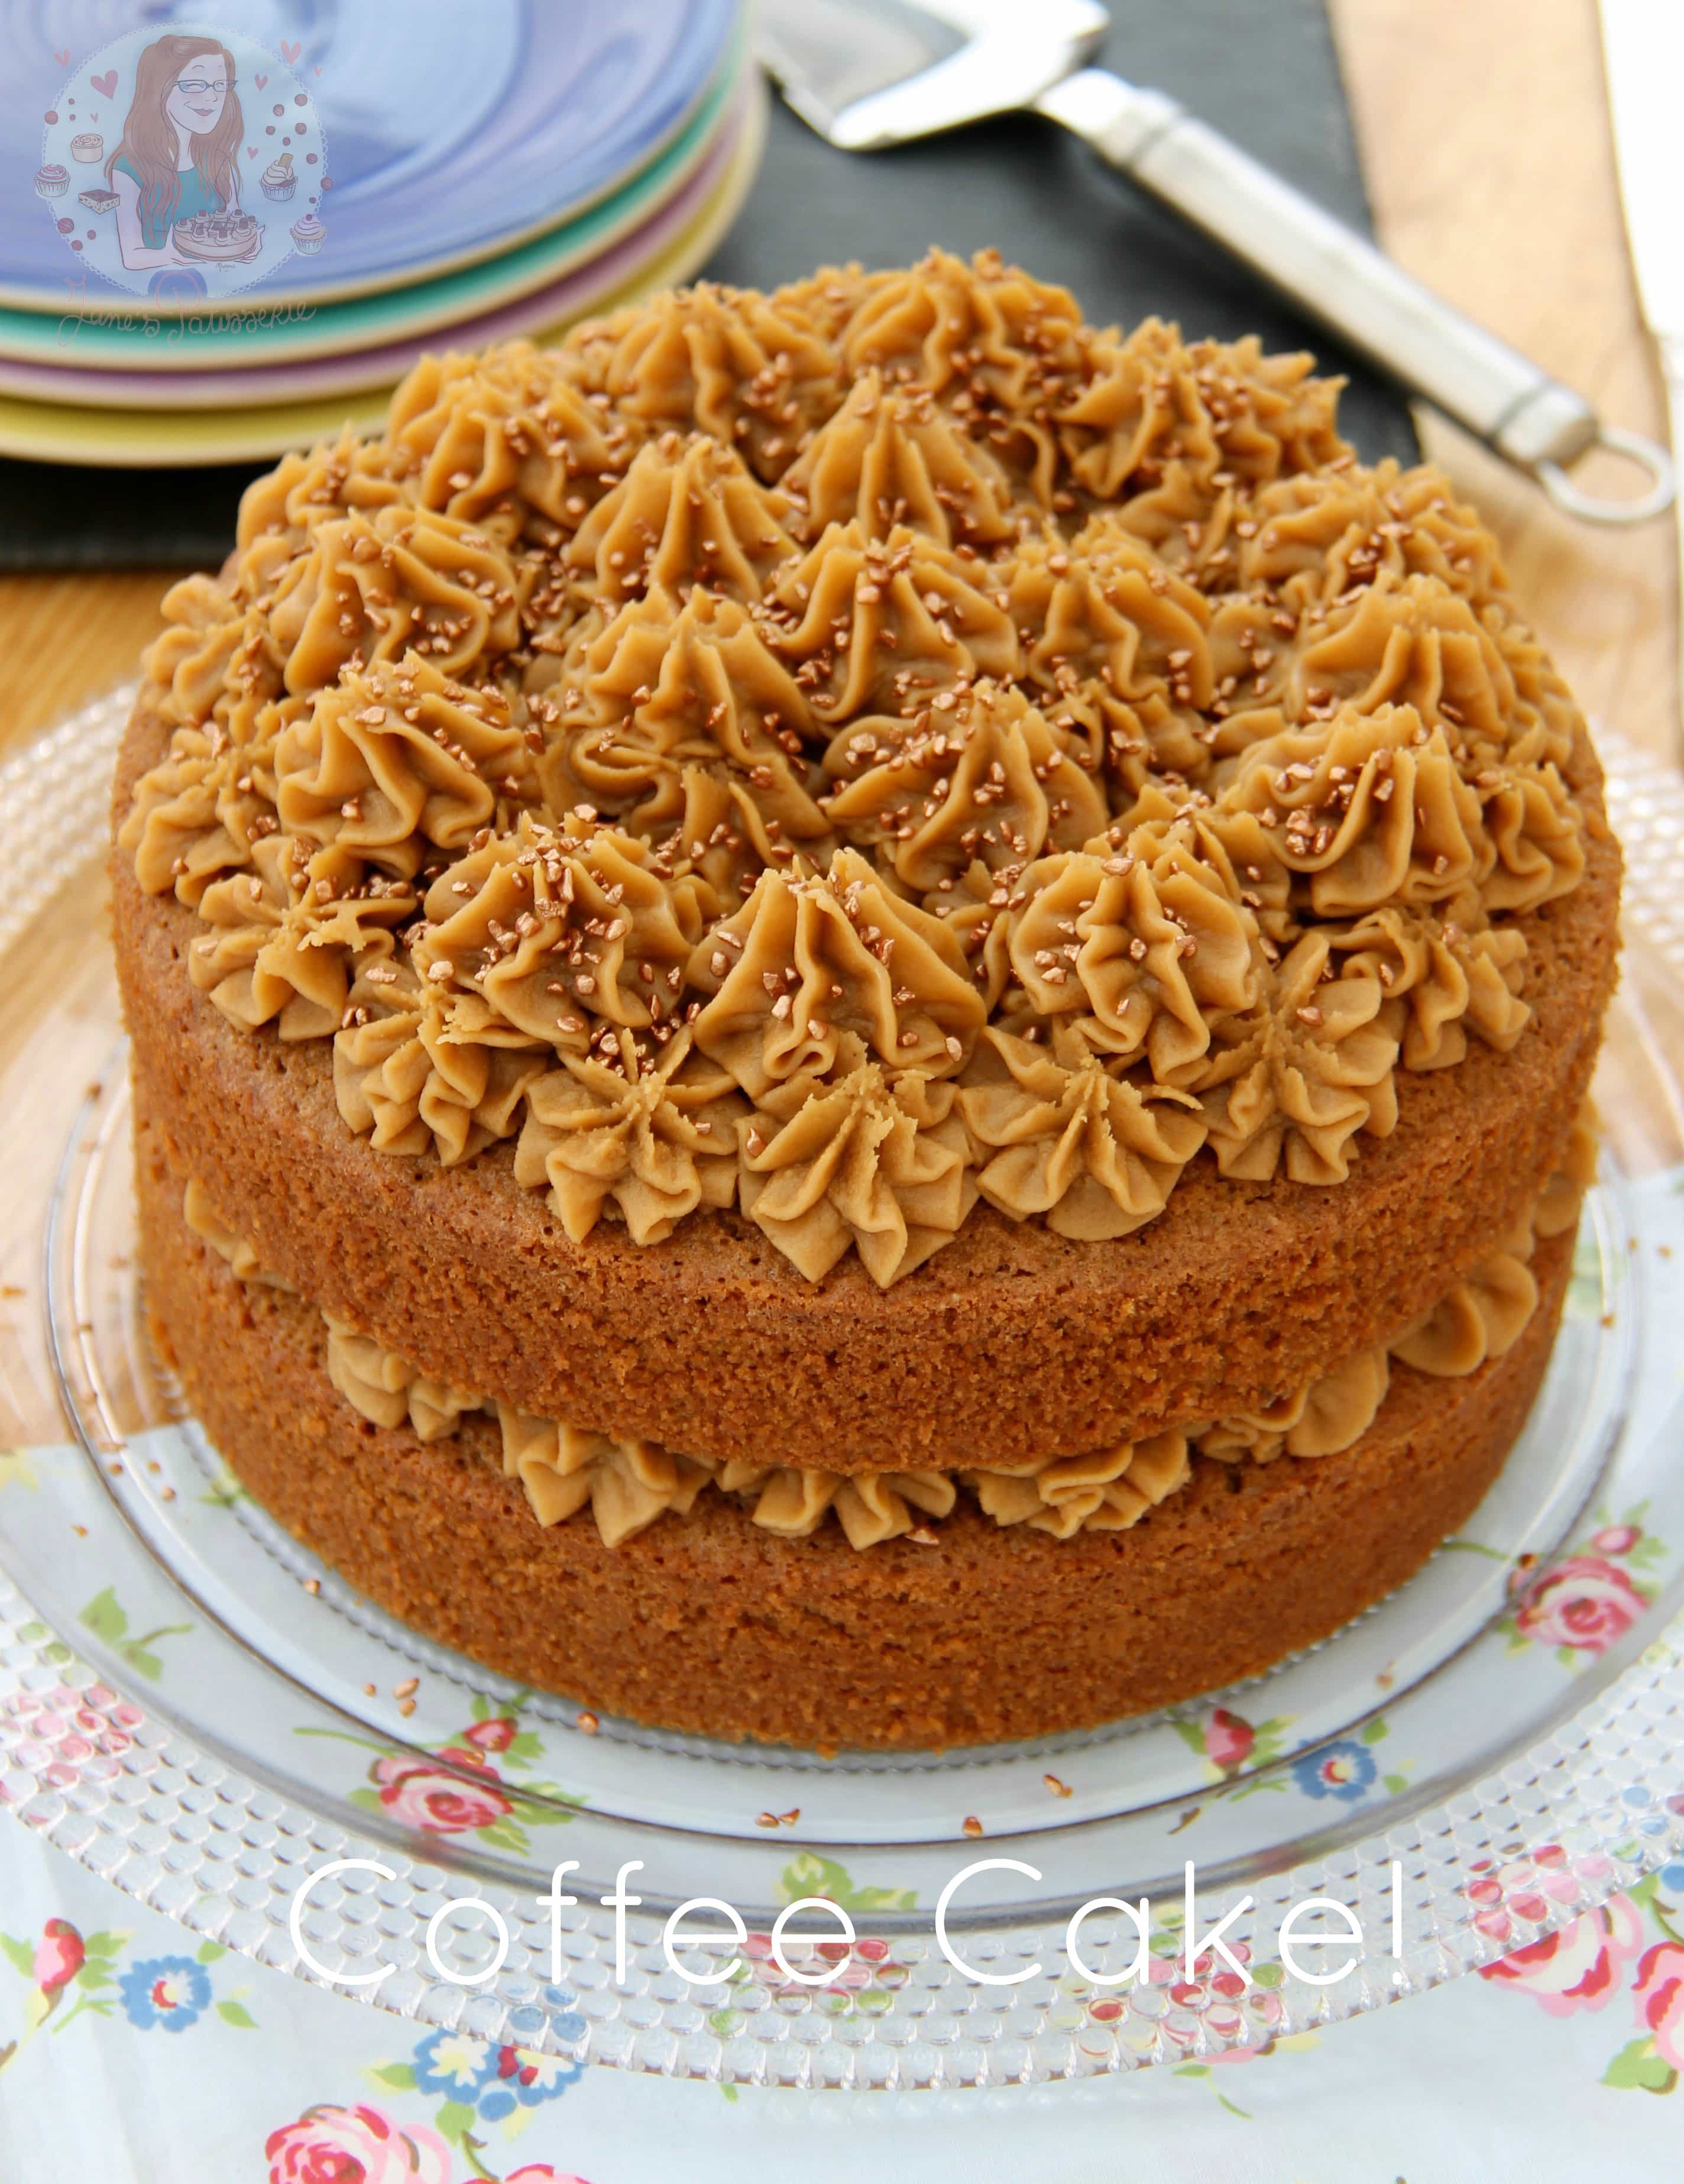 Coffee Cake! - Jane's Patisserie